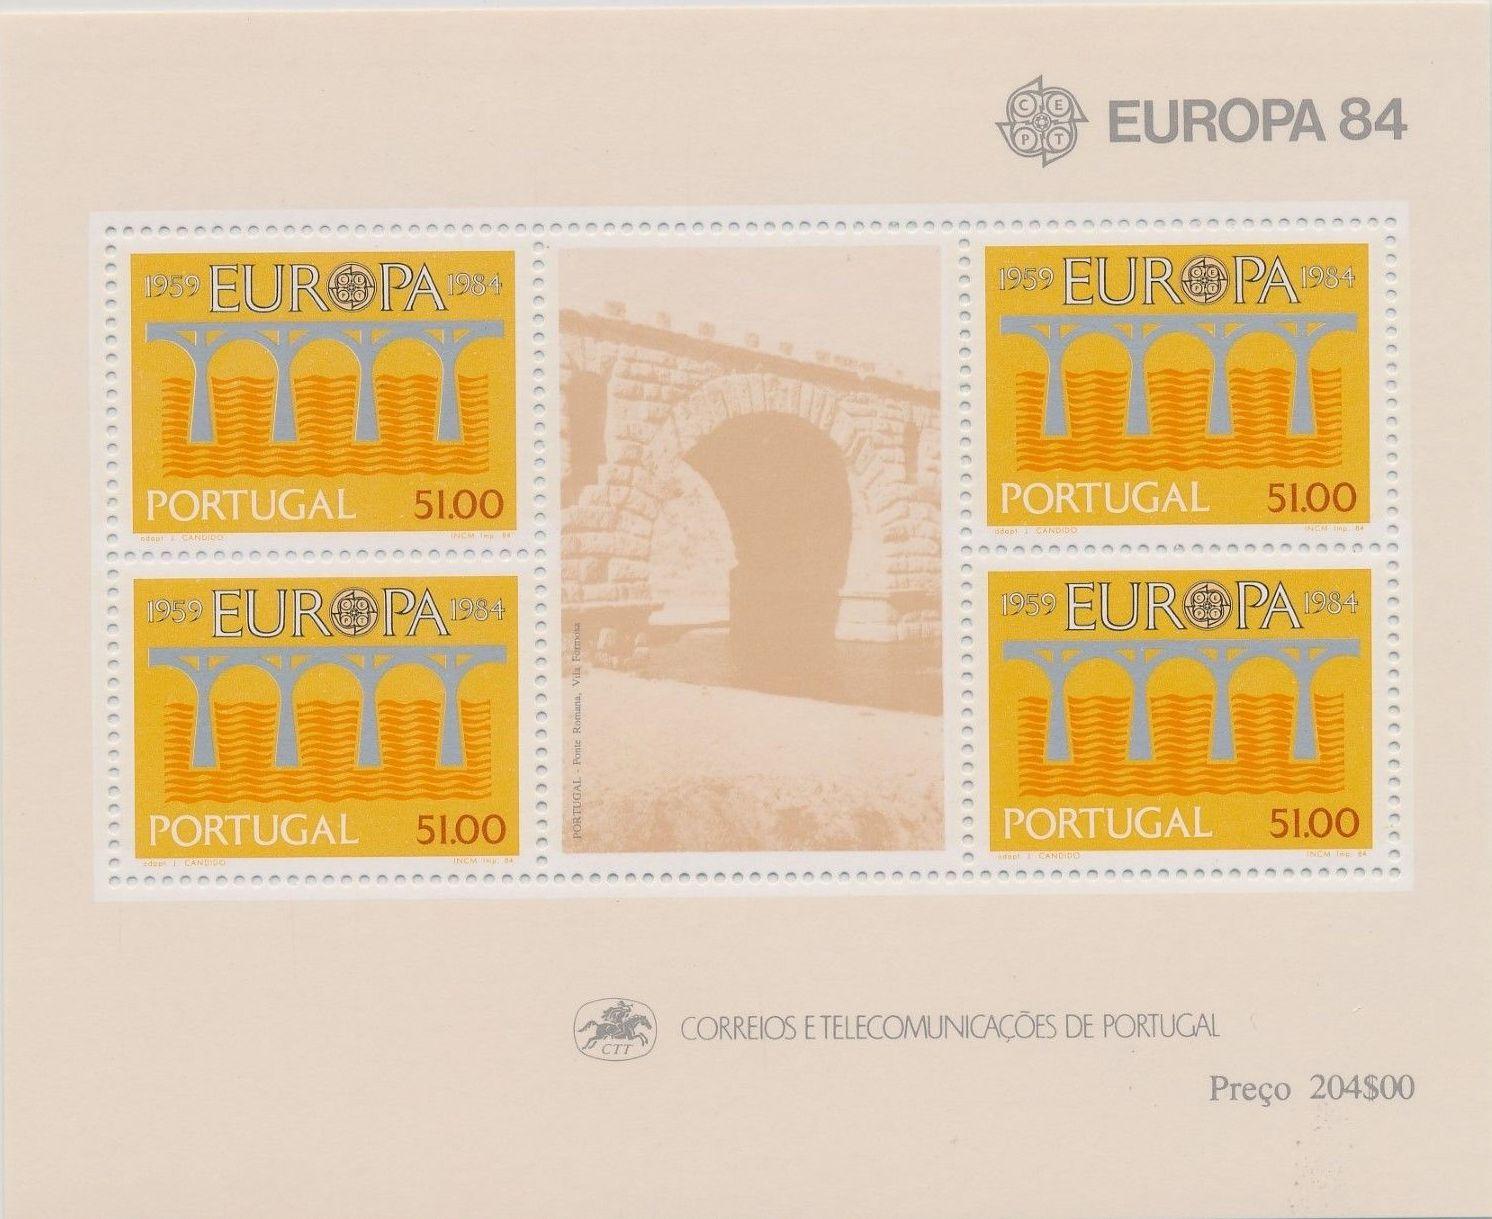 Portugal 1984 Europa